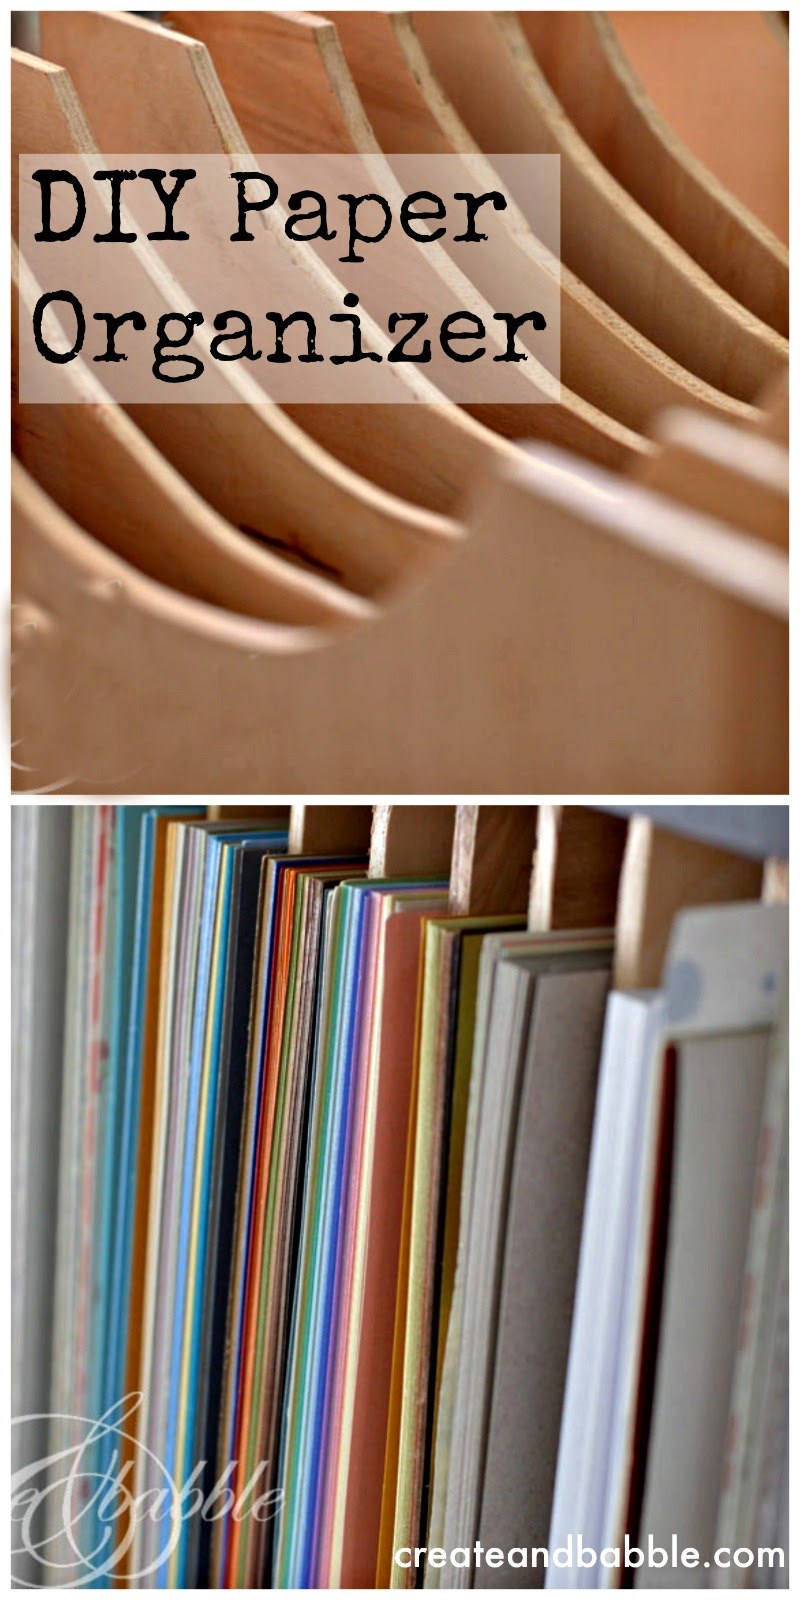 DIY Wooden Paper Organizer-createandbabble.com